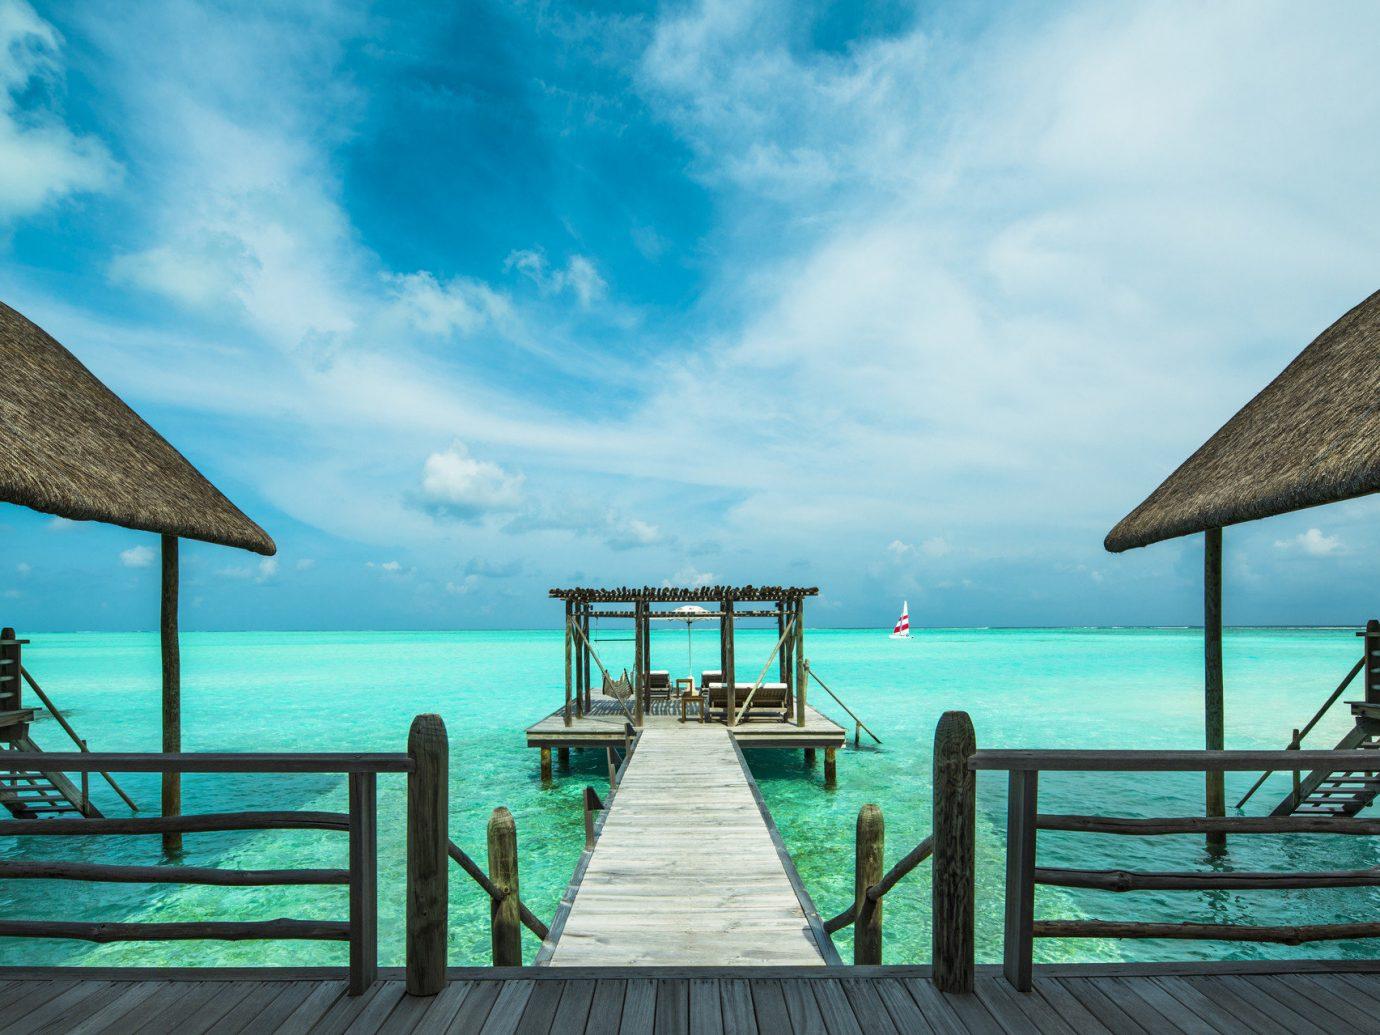 Hotels water outdoor pier sky chair scene umbrella blue Sea Ocean vacation Beach cloud Pool Coast caribbean bay Island empty swimming lined shade